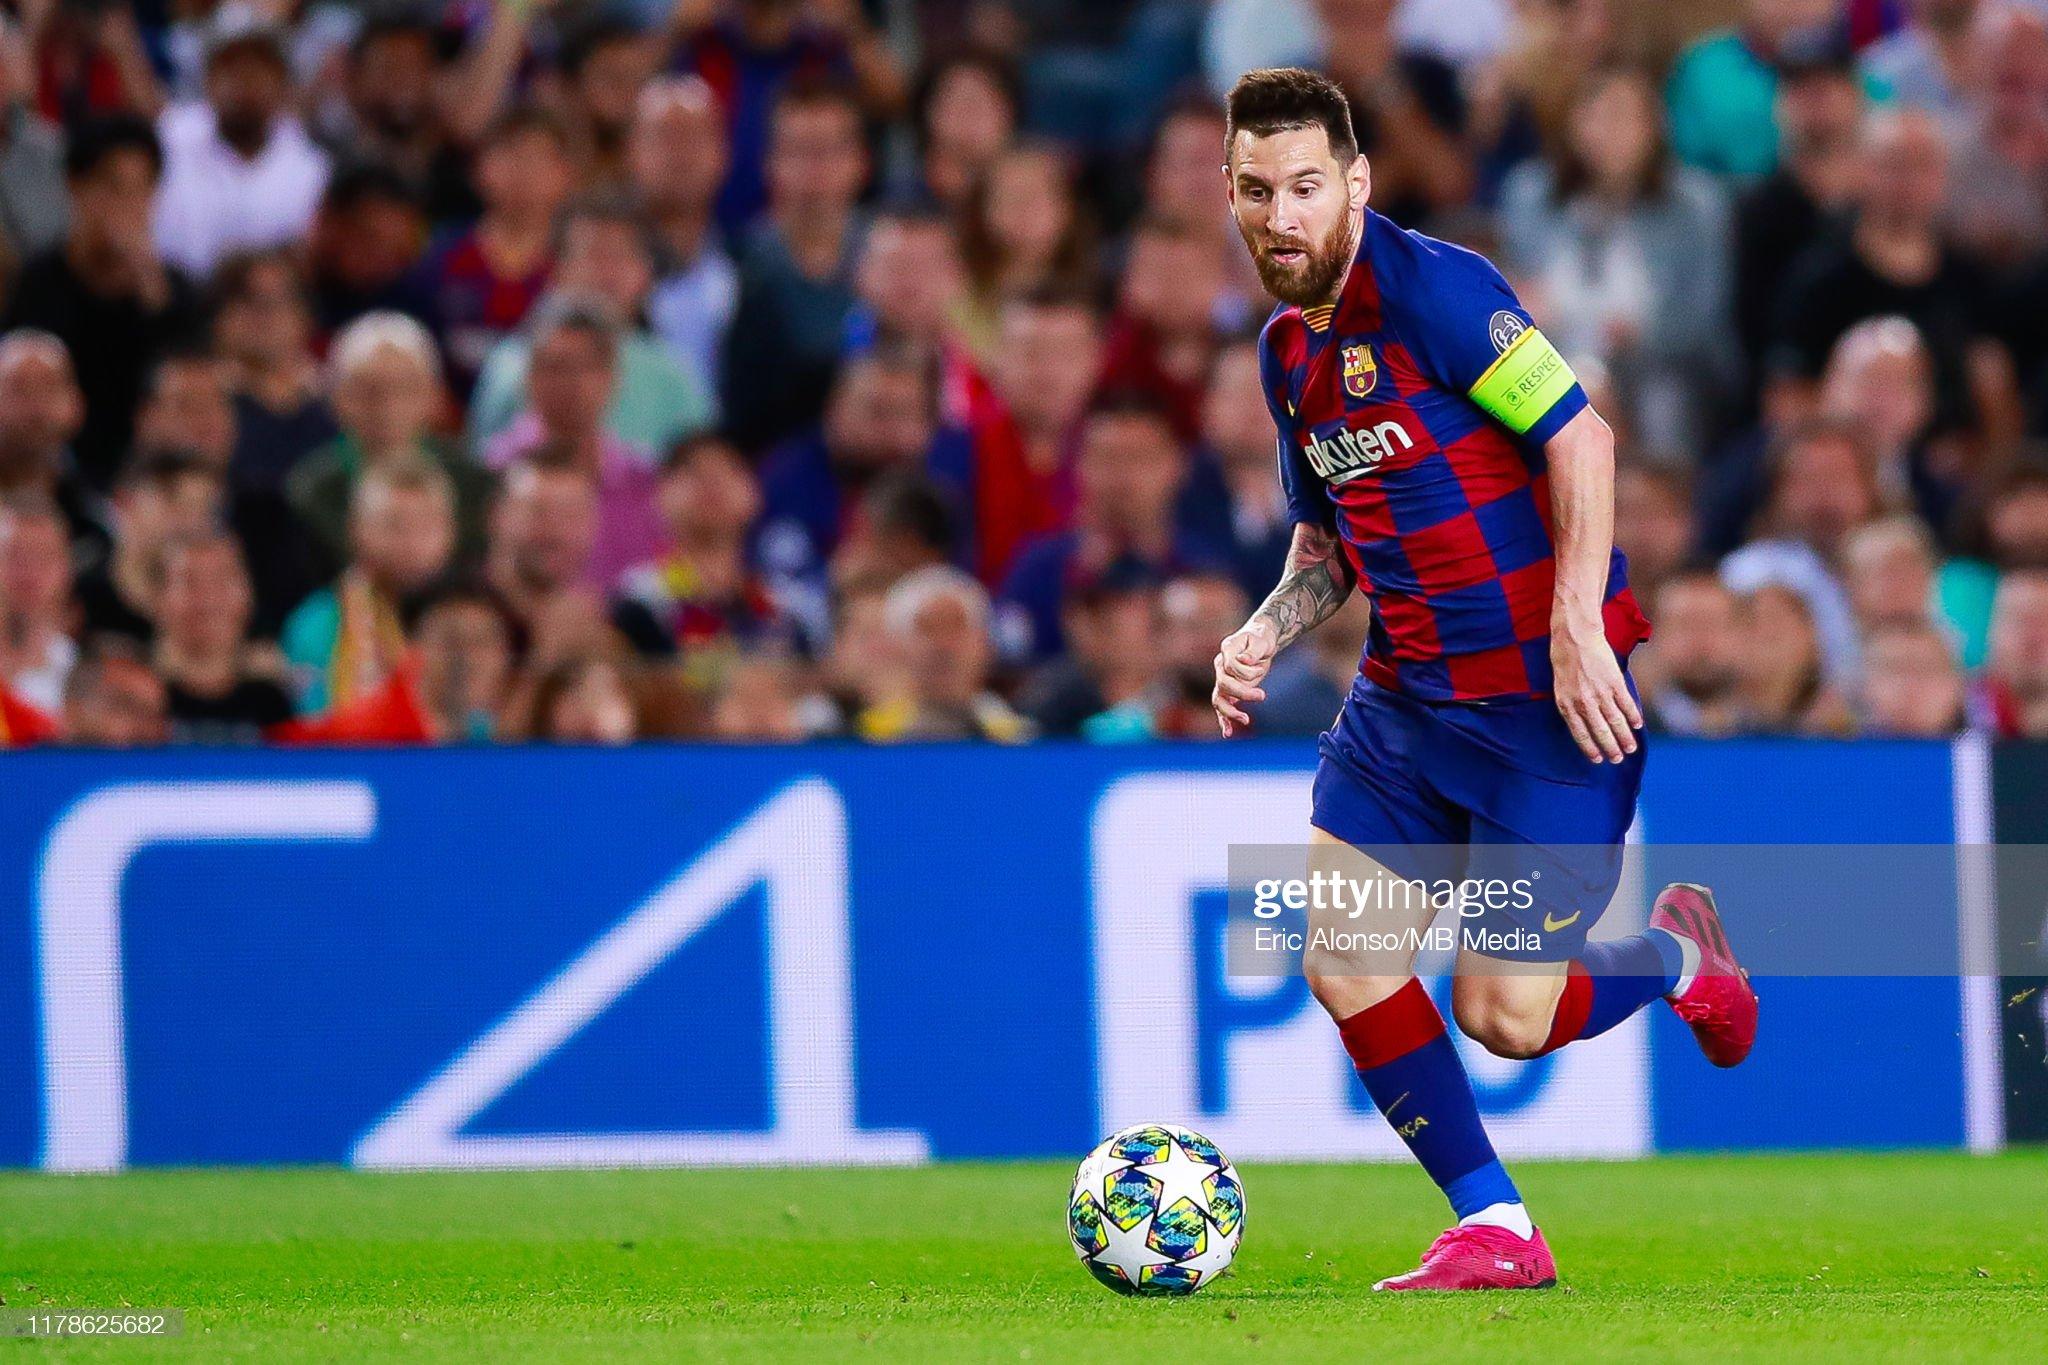 صور مباراة : برشلونة - إنتر 2-1 ( 02-10-2019 )  Lionel-messi-of-fc-barcelona-runs-with-the-ball-during-the-uefa-f-picture-id1178625682?s=2048x2048